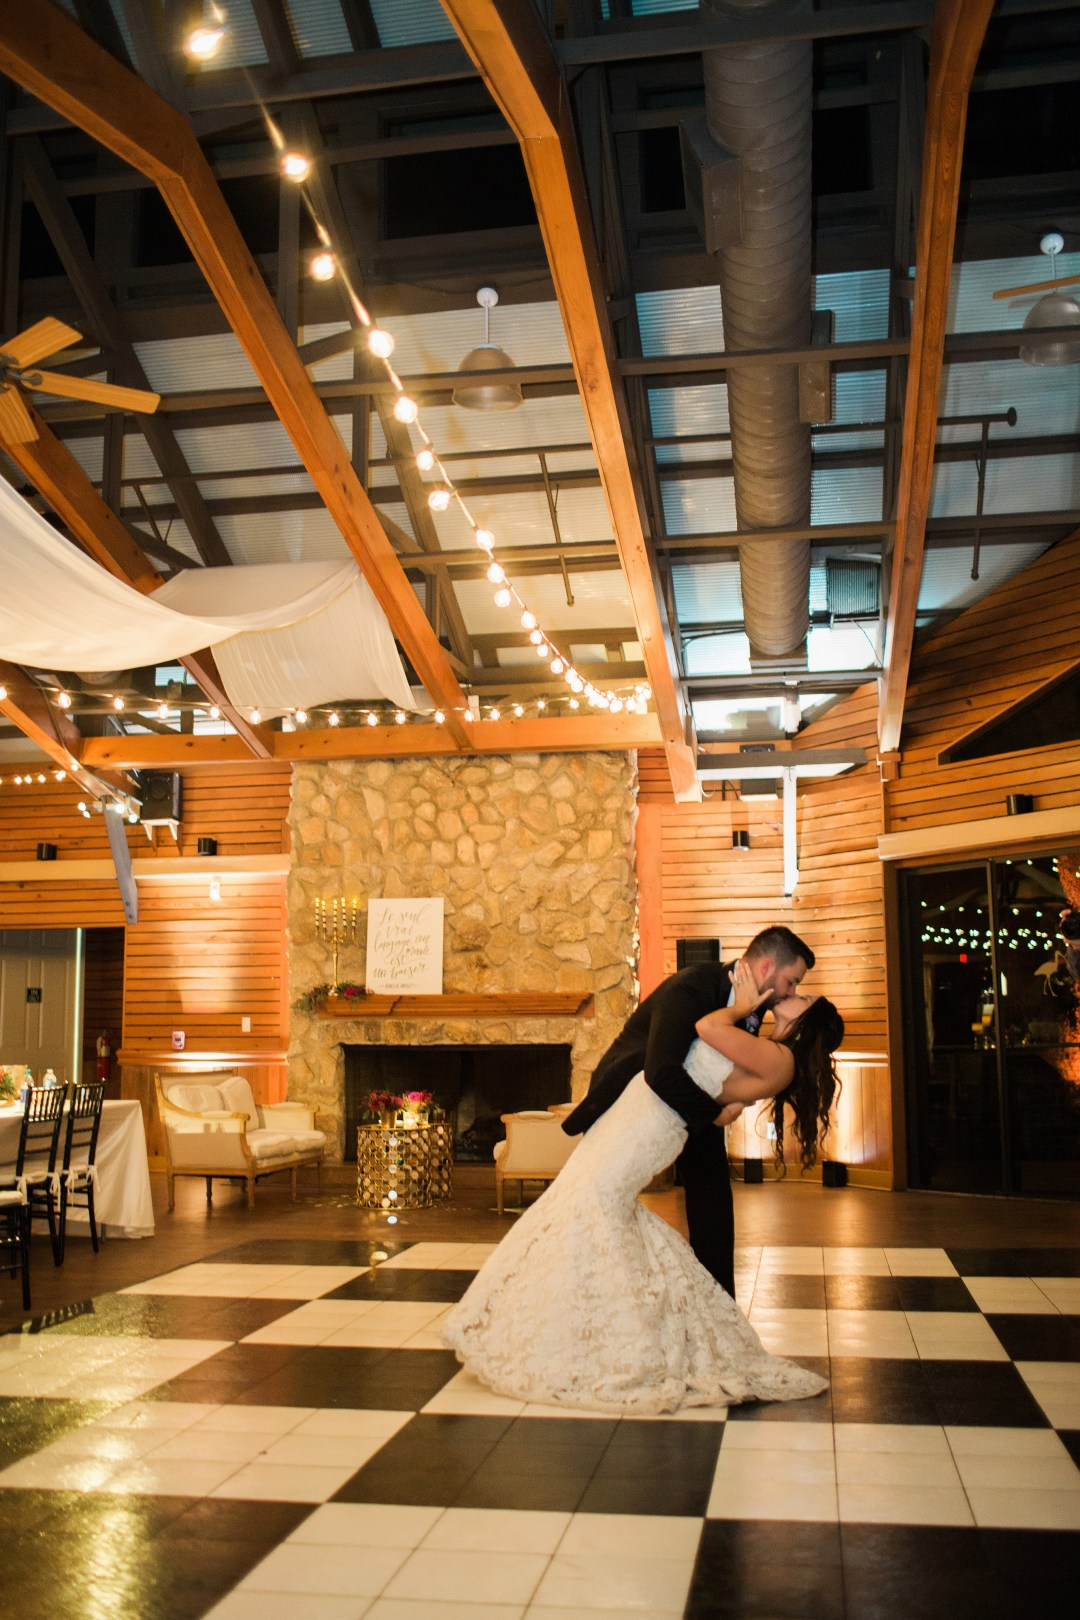 Florida fall wedding, last dance, wedding ideas, first dance songs